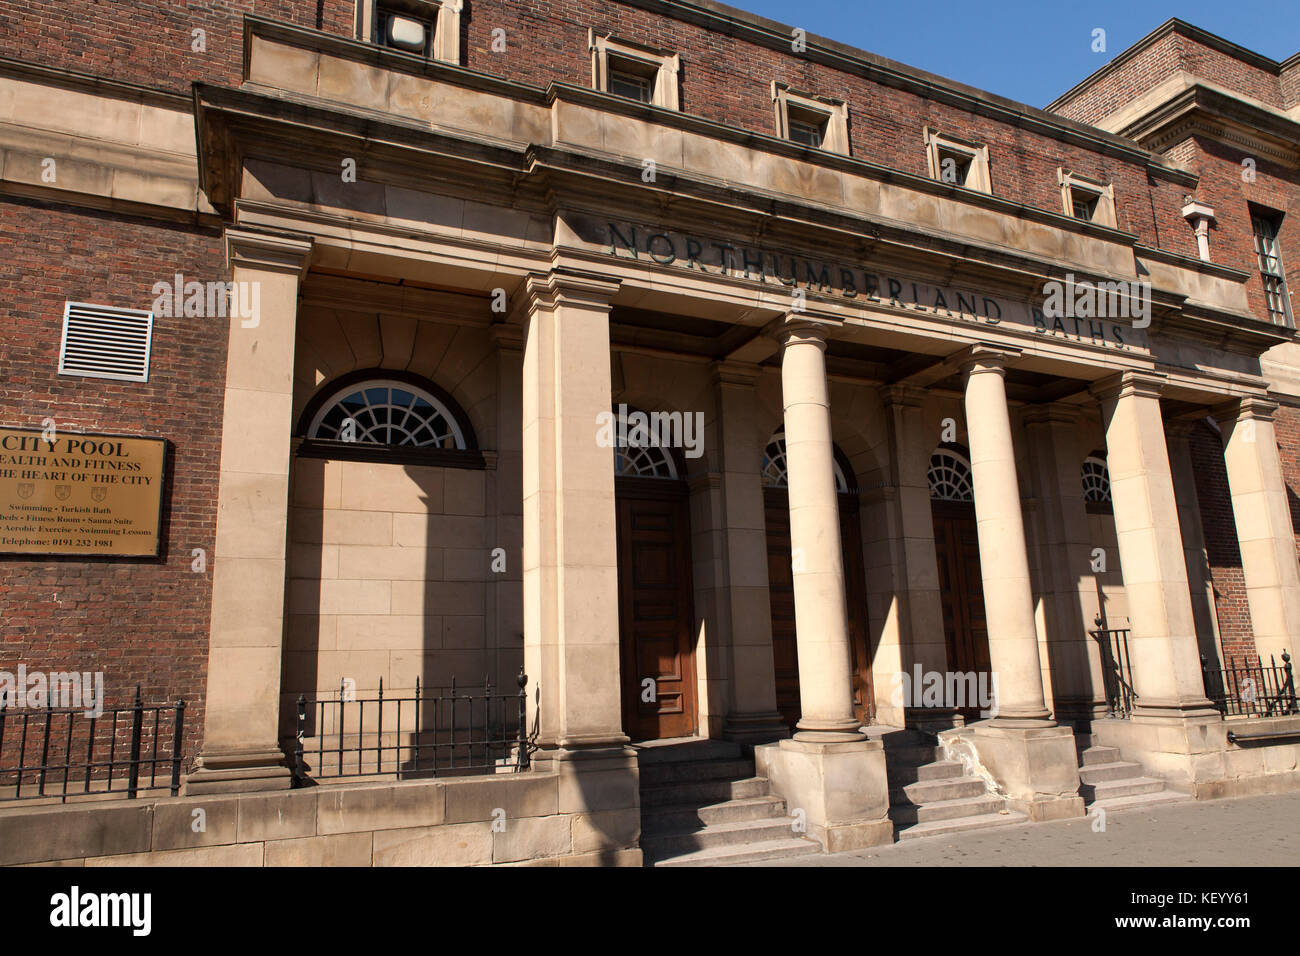 Public Swimming Baths Stock Photos Public Swimming Baths Stock Images Alamy